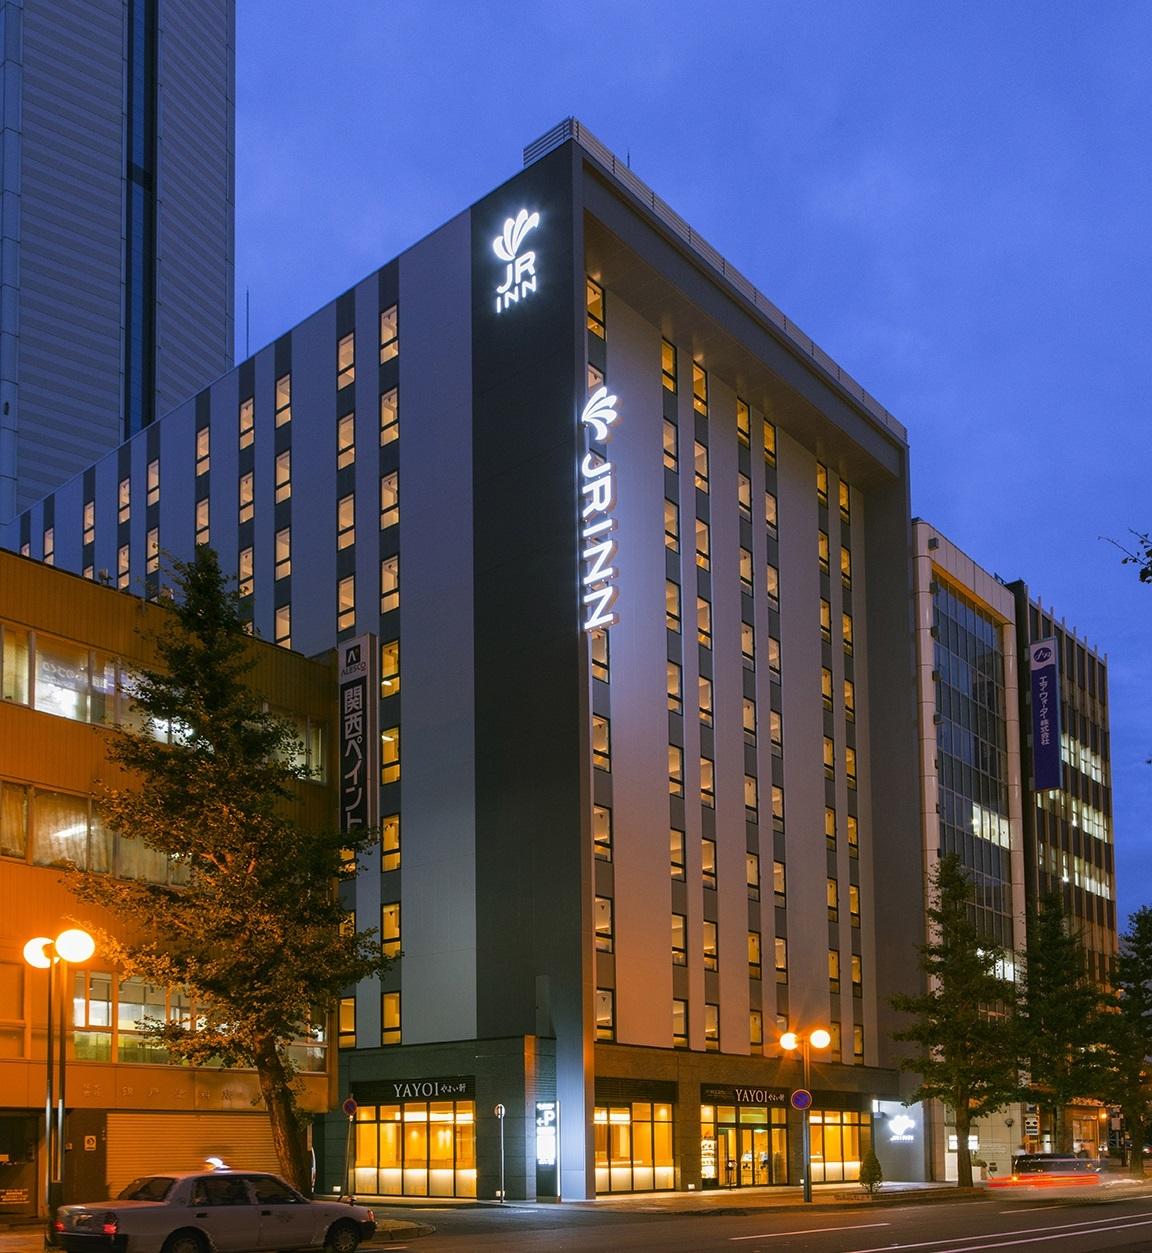 JRイン札幌駅南口 【直前割】 素泊り 直前のご予約でもお得に! ■大浴場完備 (TLL) RC